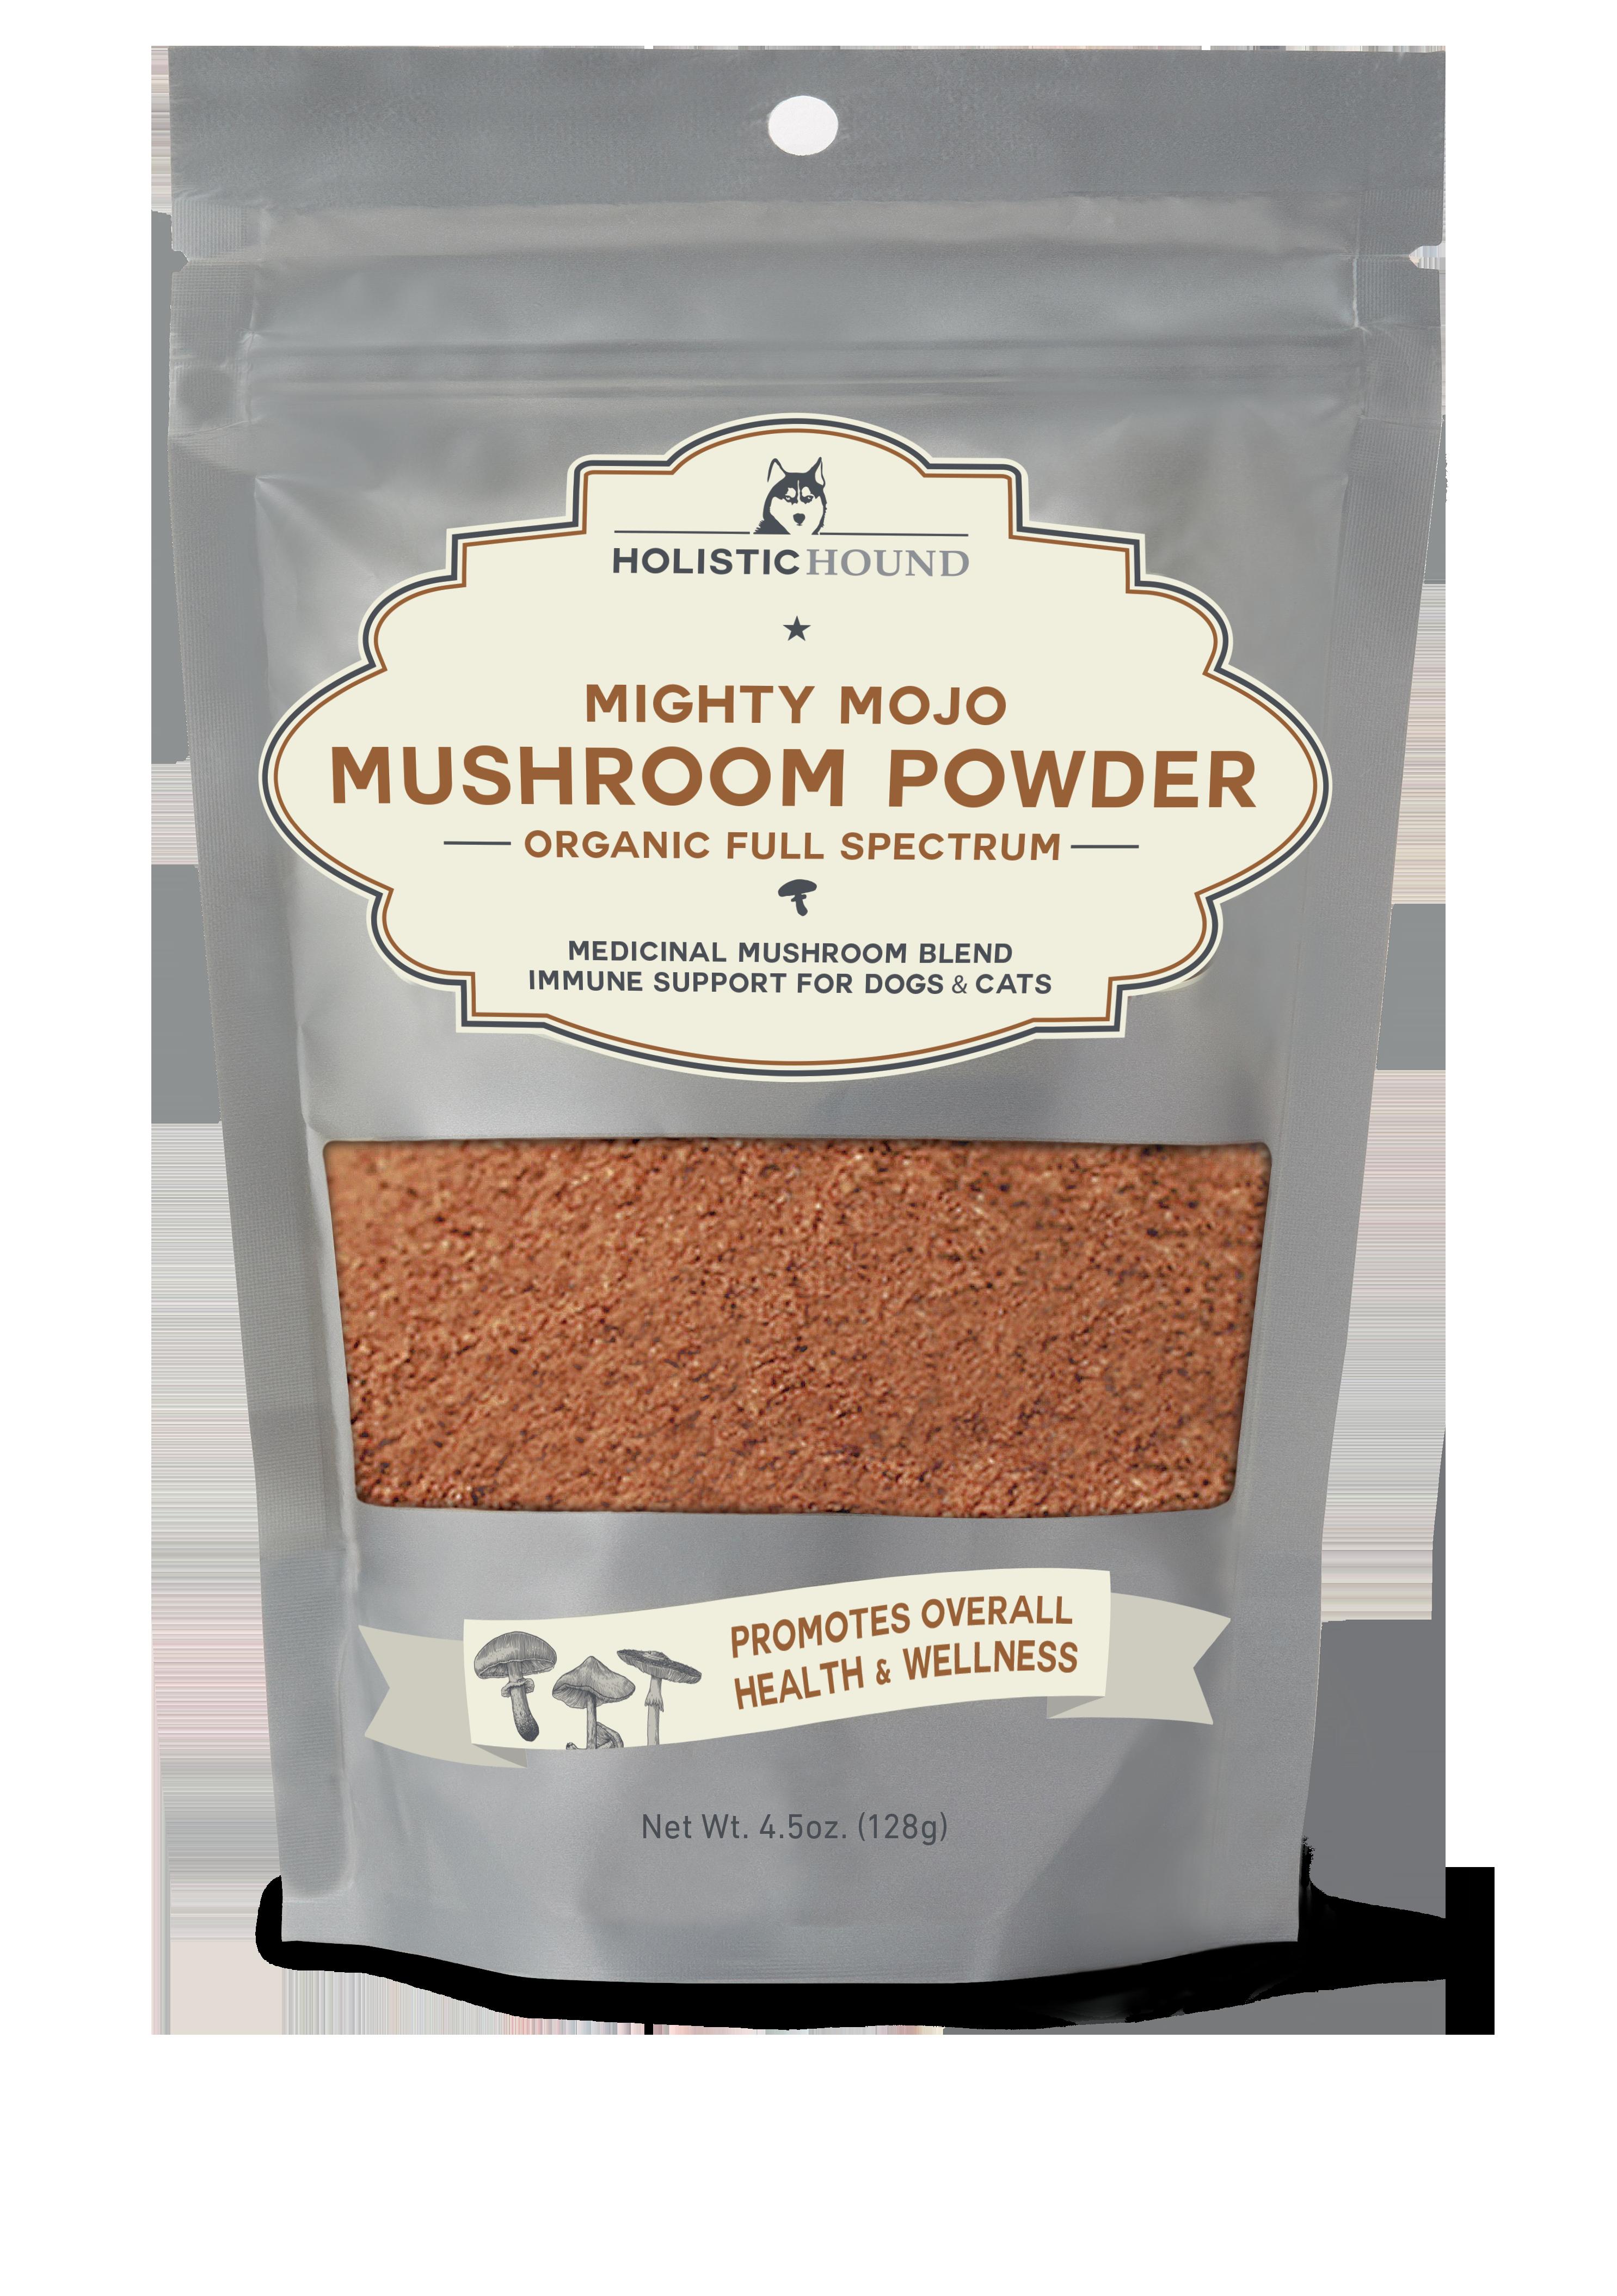 Holistic Hound Mushroom Powder for Pets, 4.5-oz